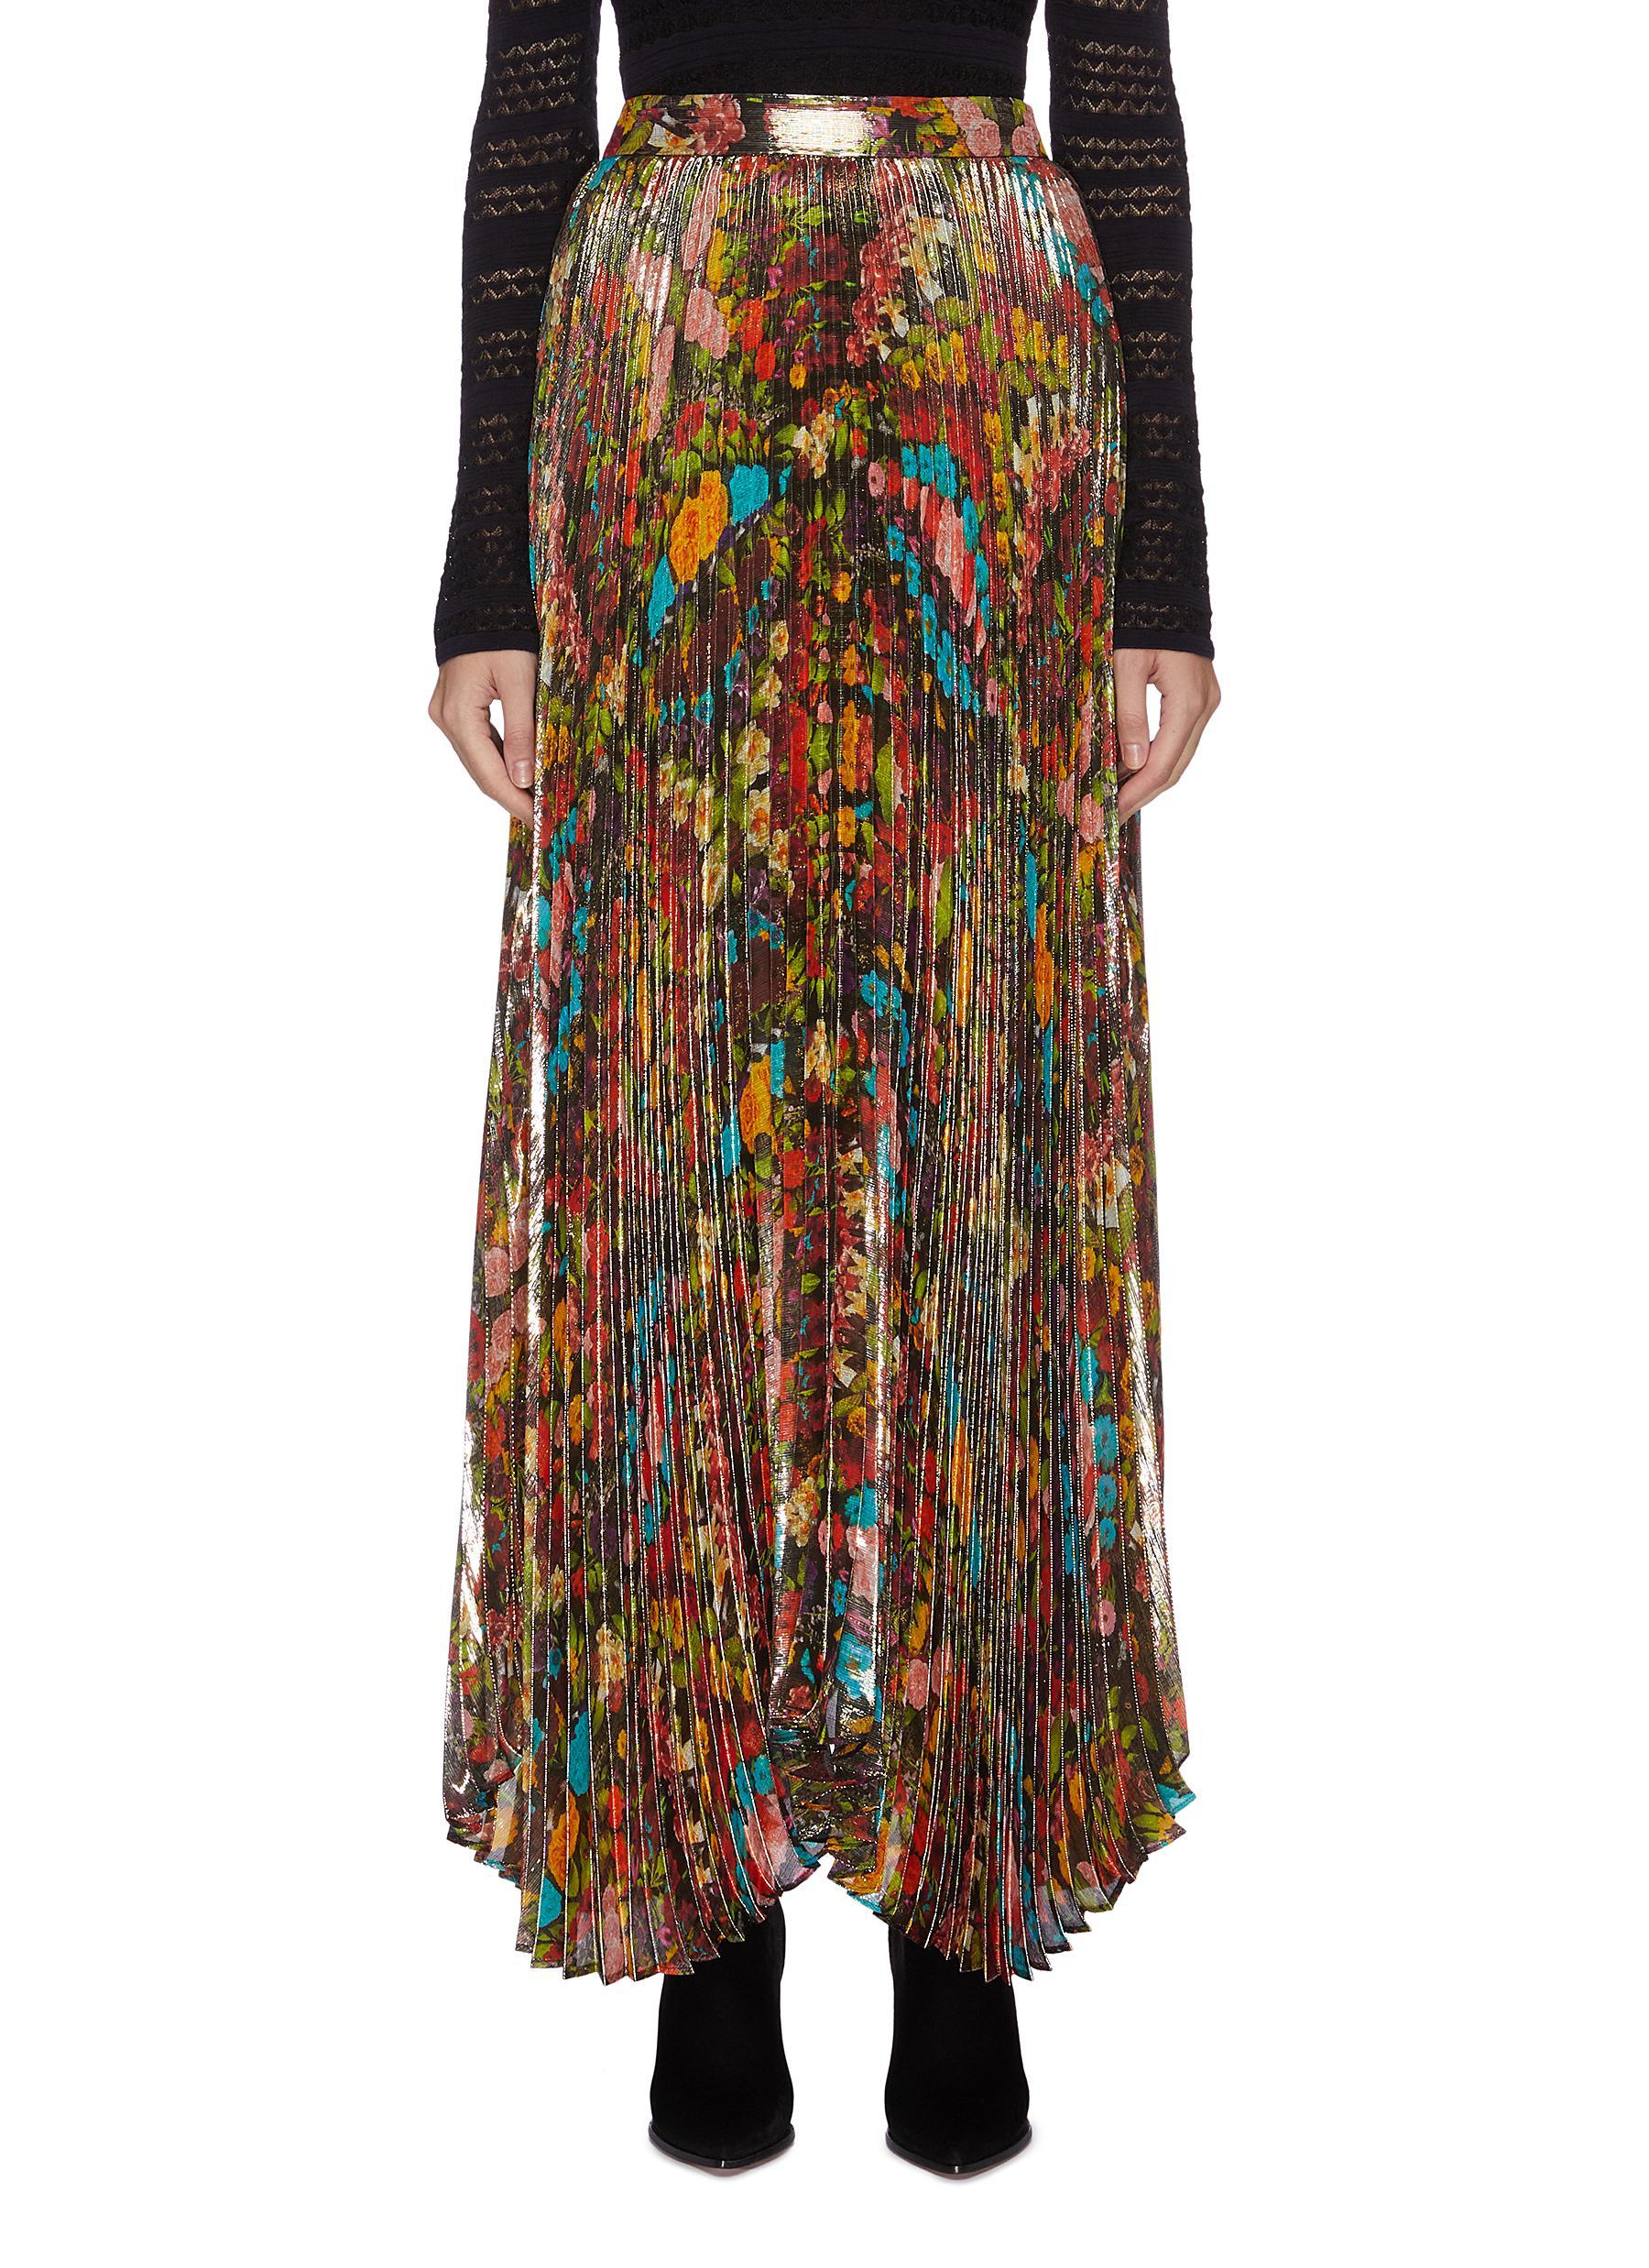 Buy Alice + Olivia Skirts 'Katz' pleated floral-print metallic maxi skirt